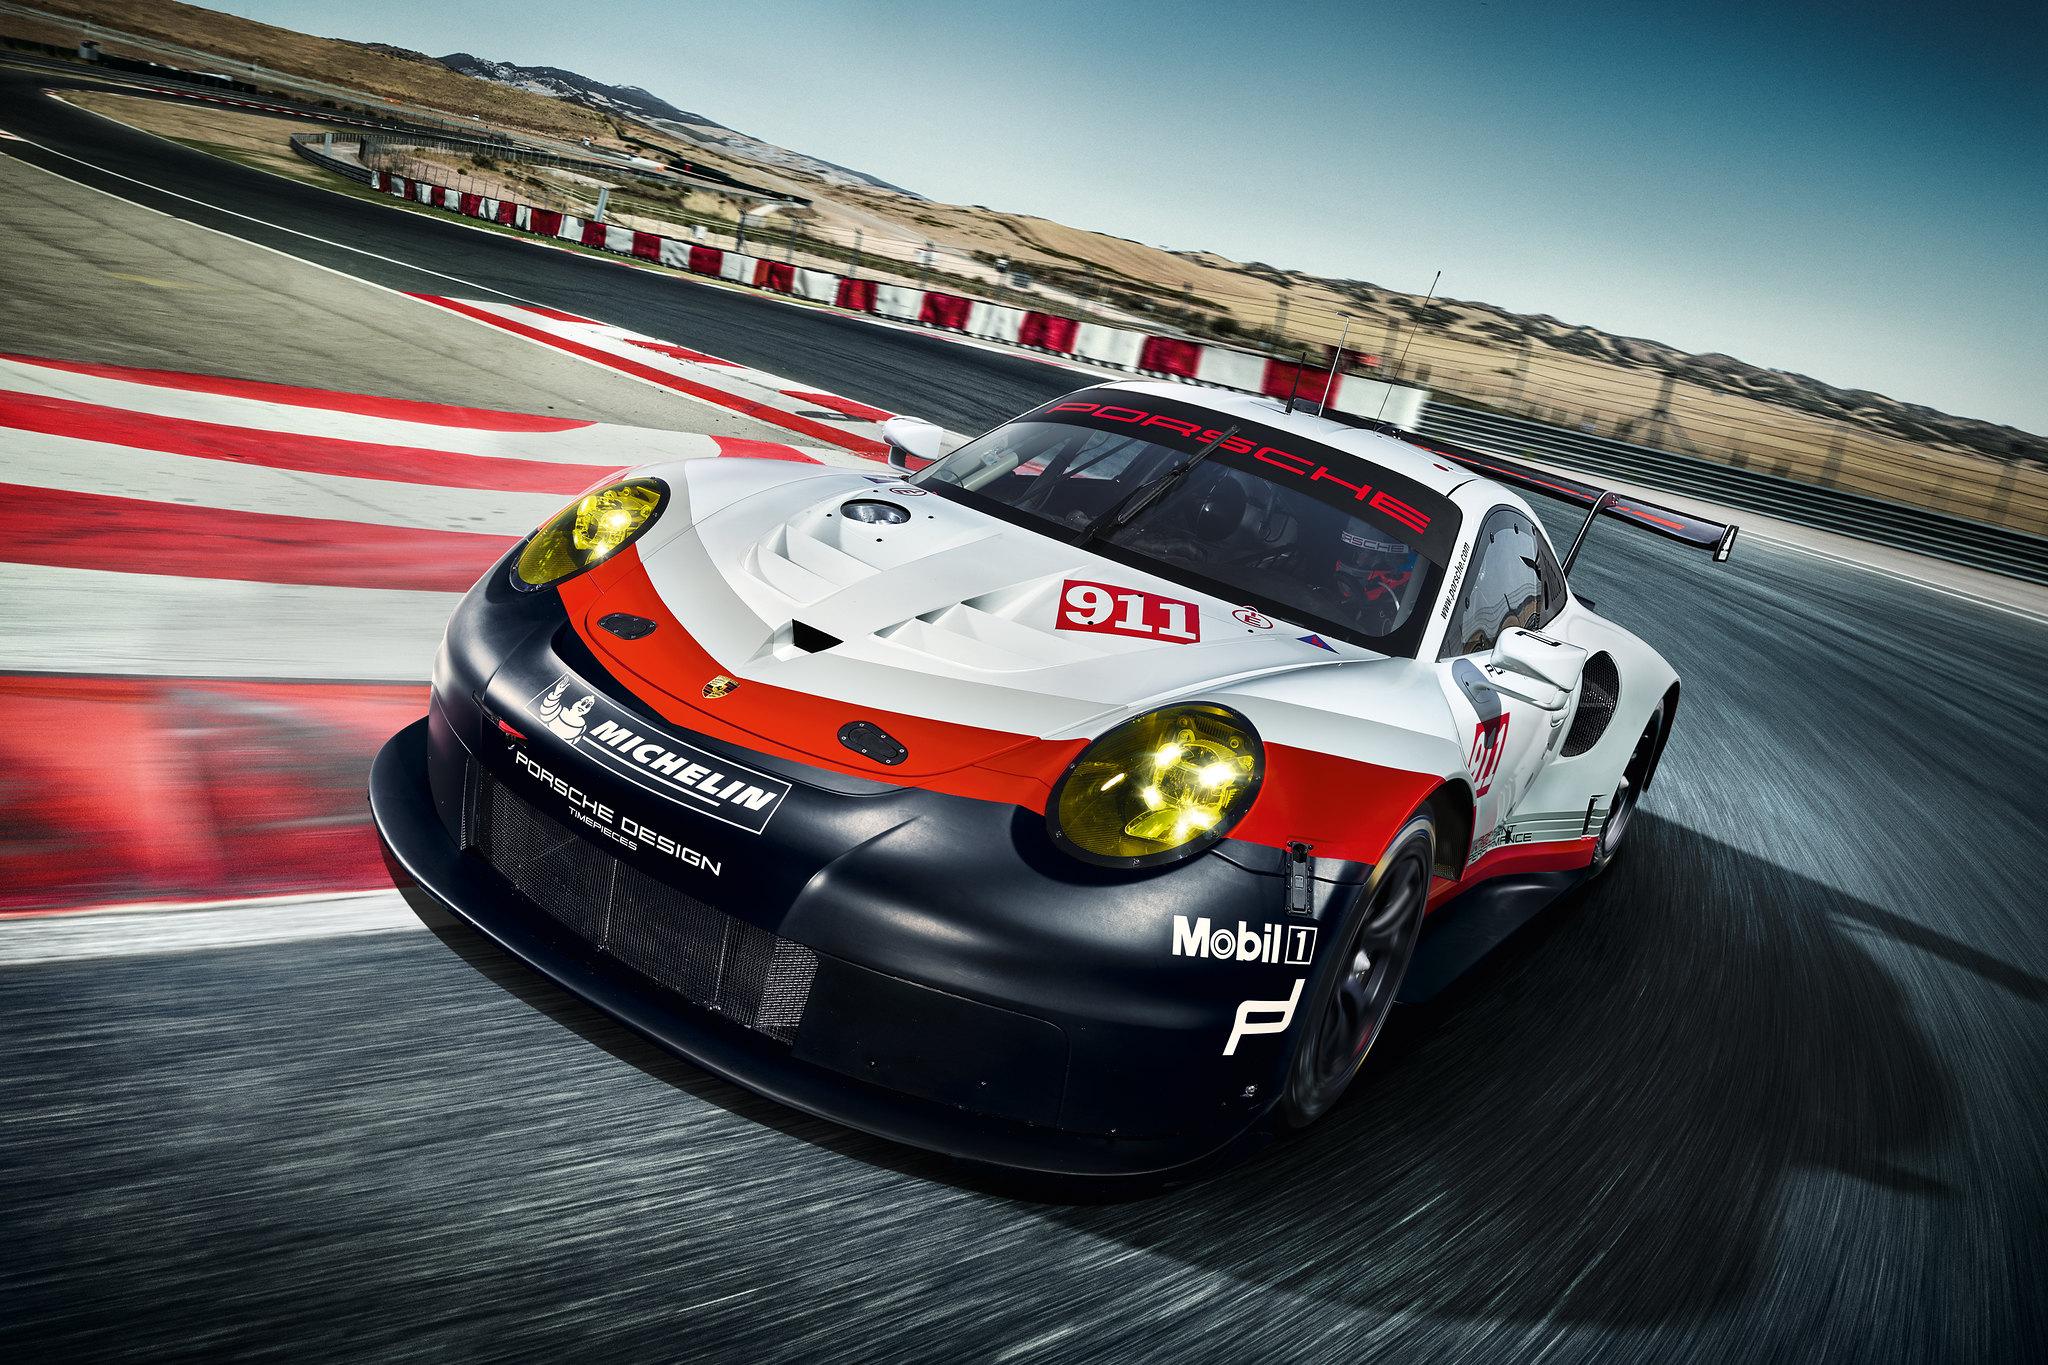 This is the Porsche 911 RSR